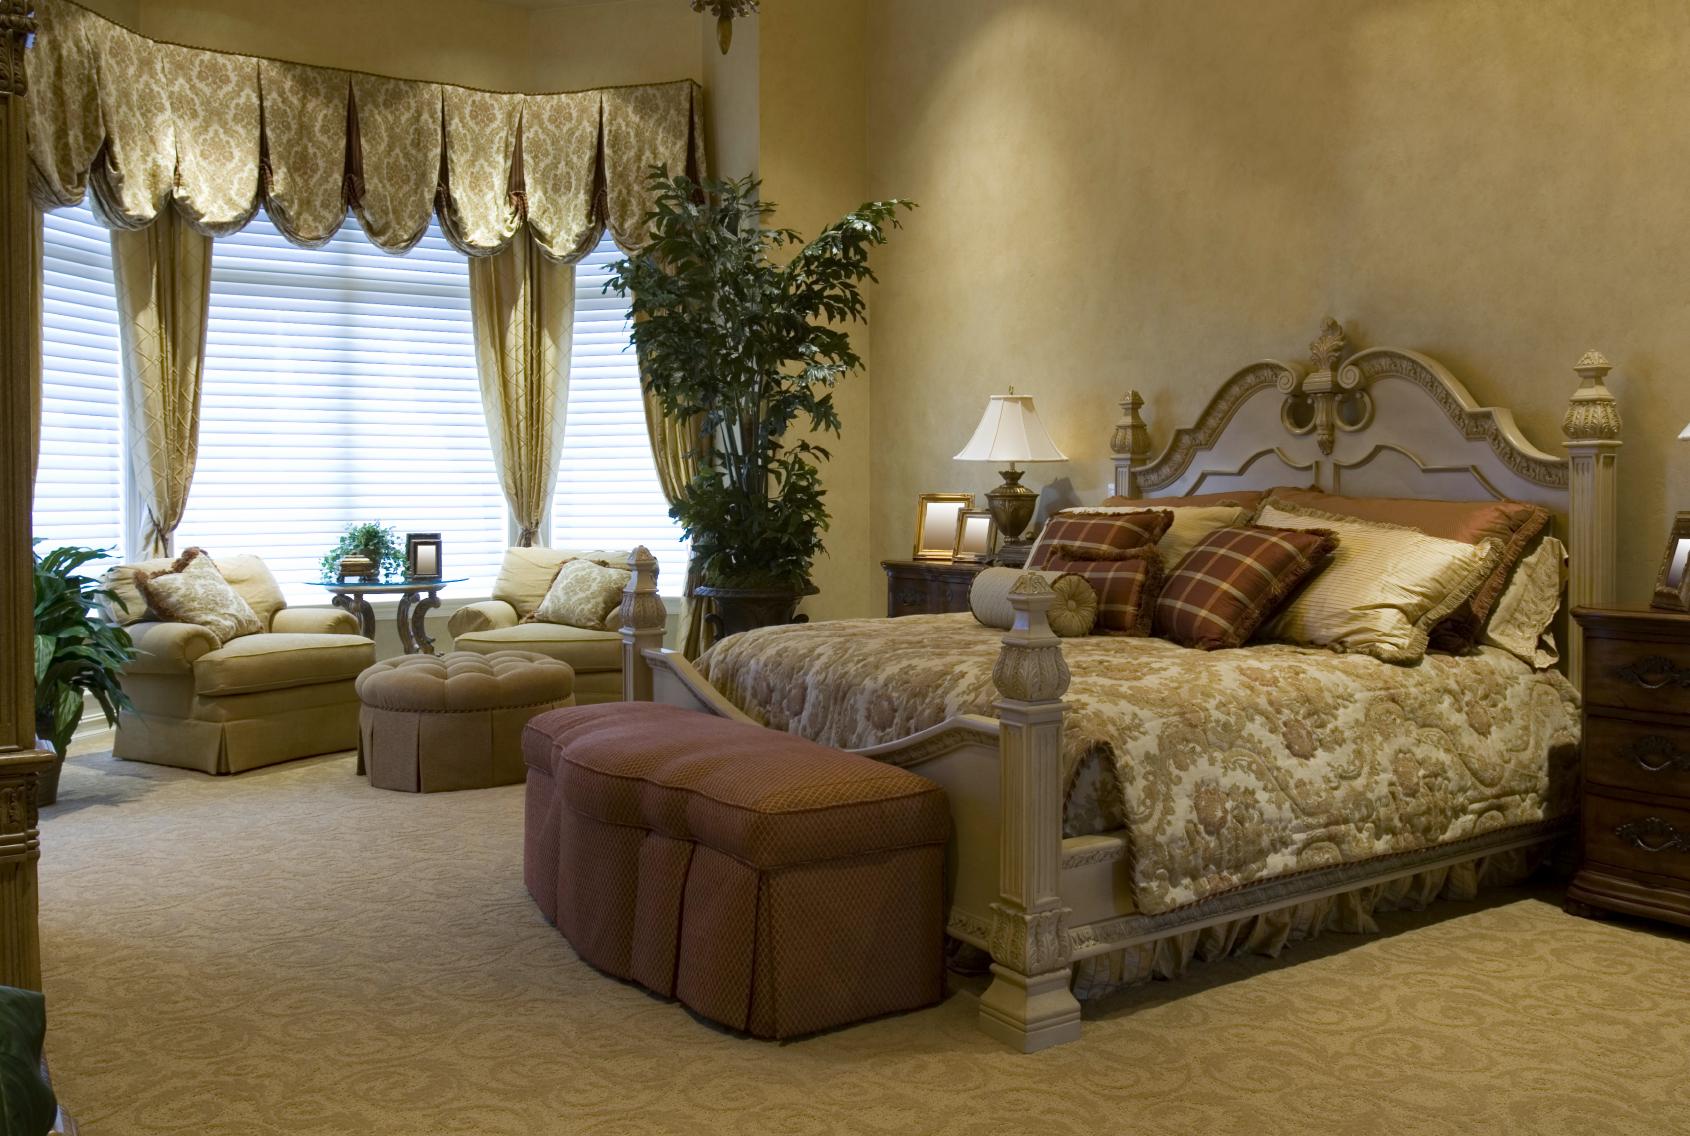 custom-blinds-drapery-shades-interior-design-atlanta-georgia-8.jpg